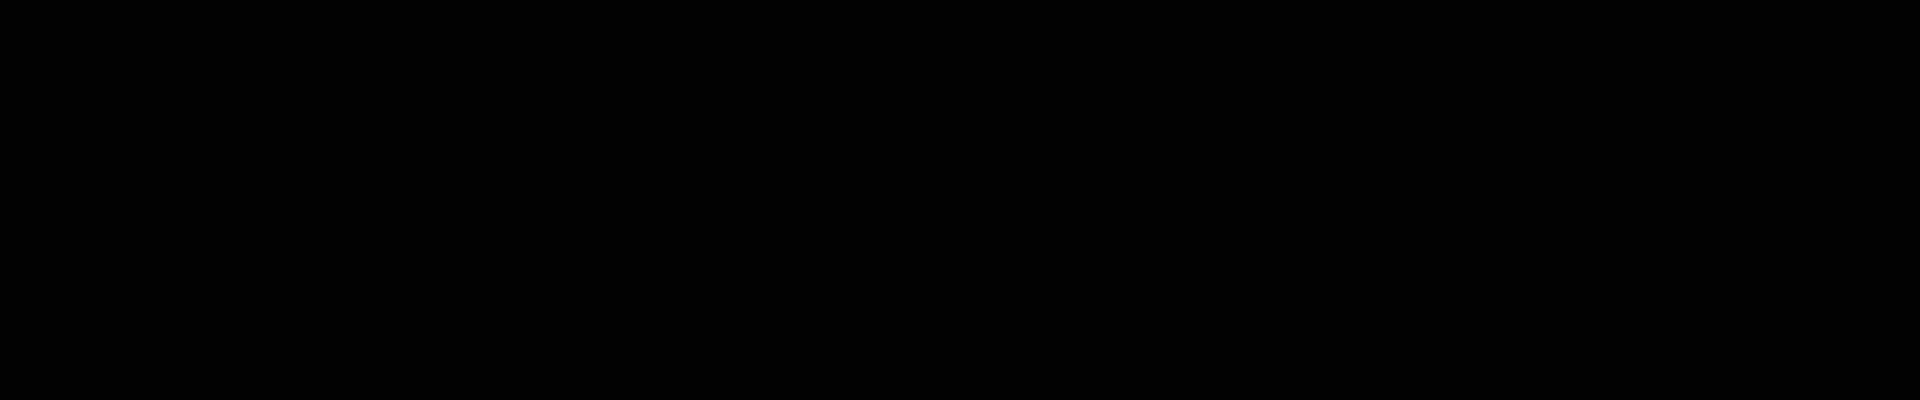 NYE 2018 Science World 1920×400